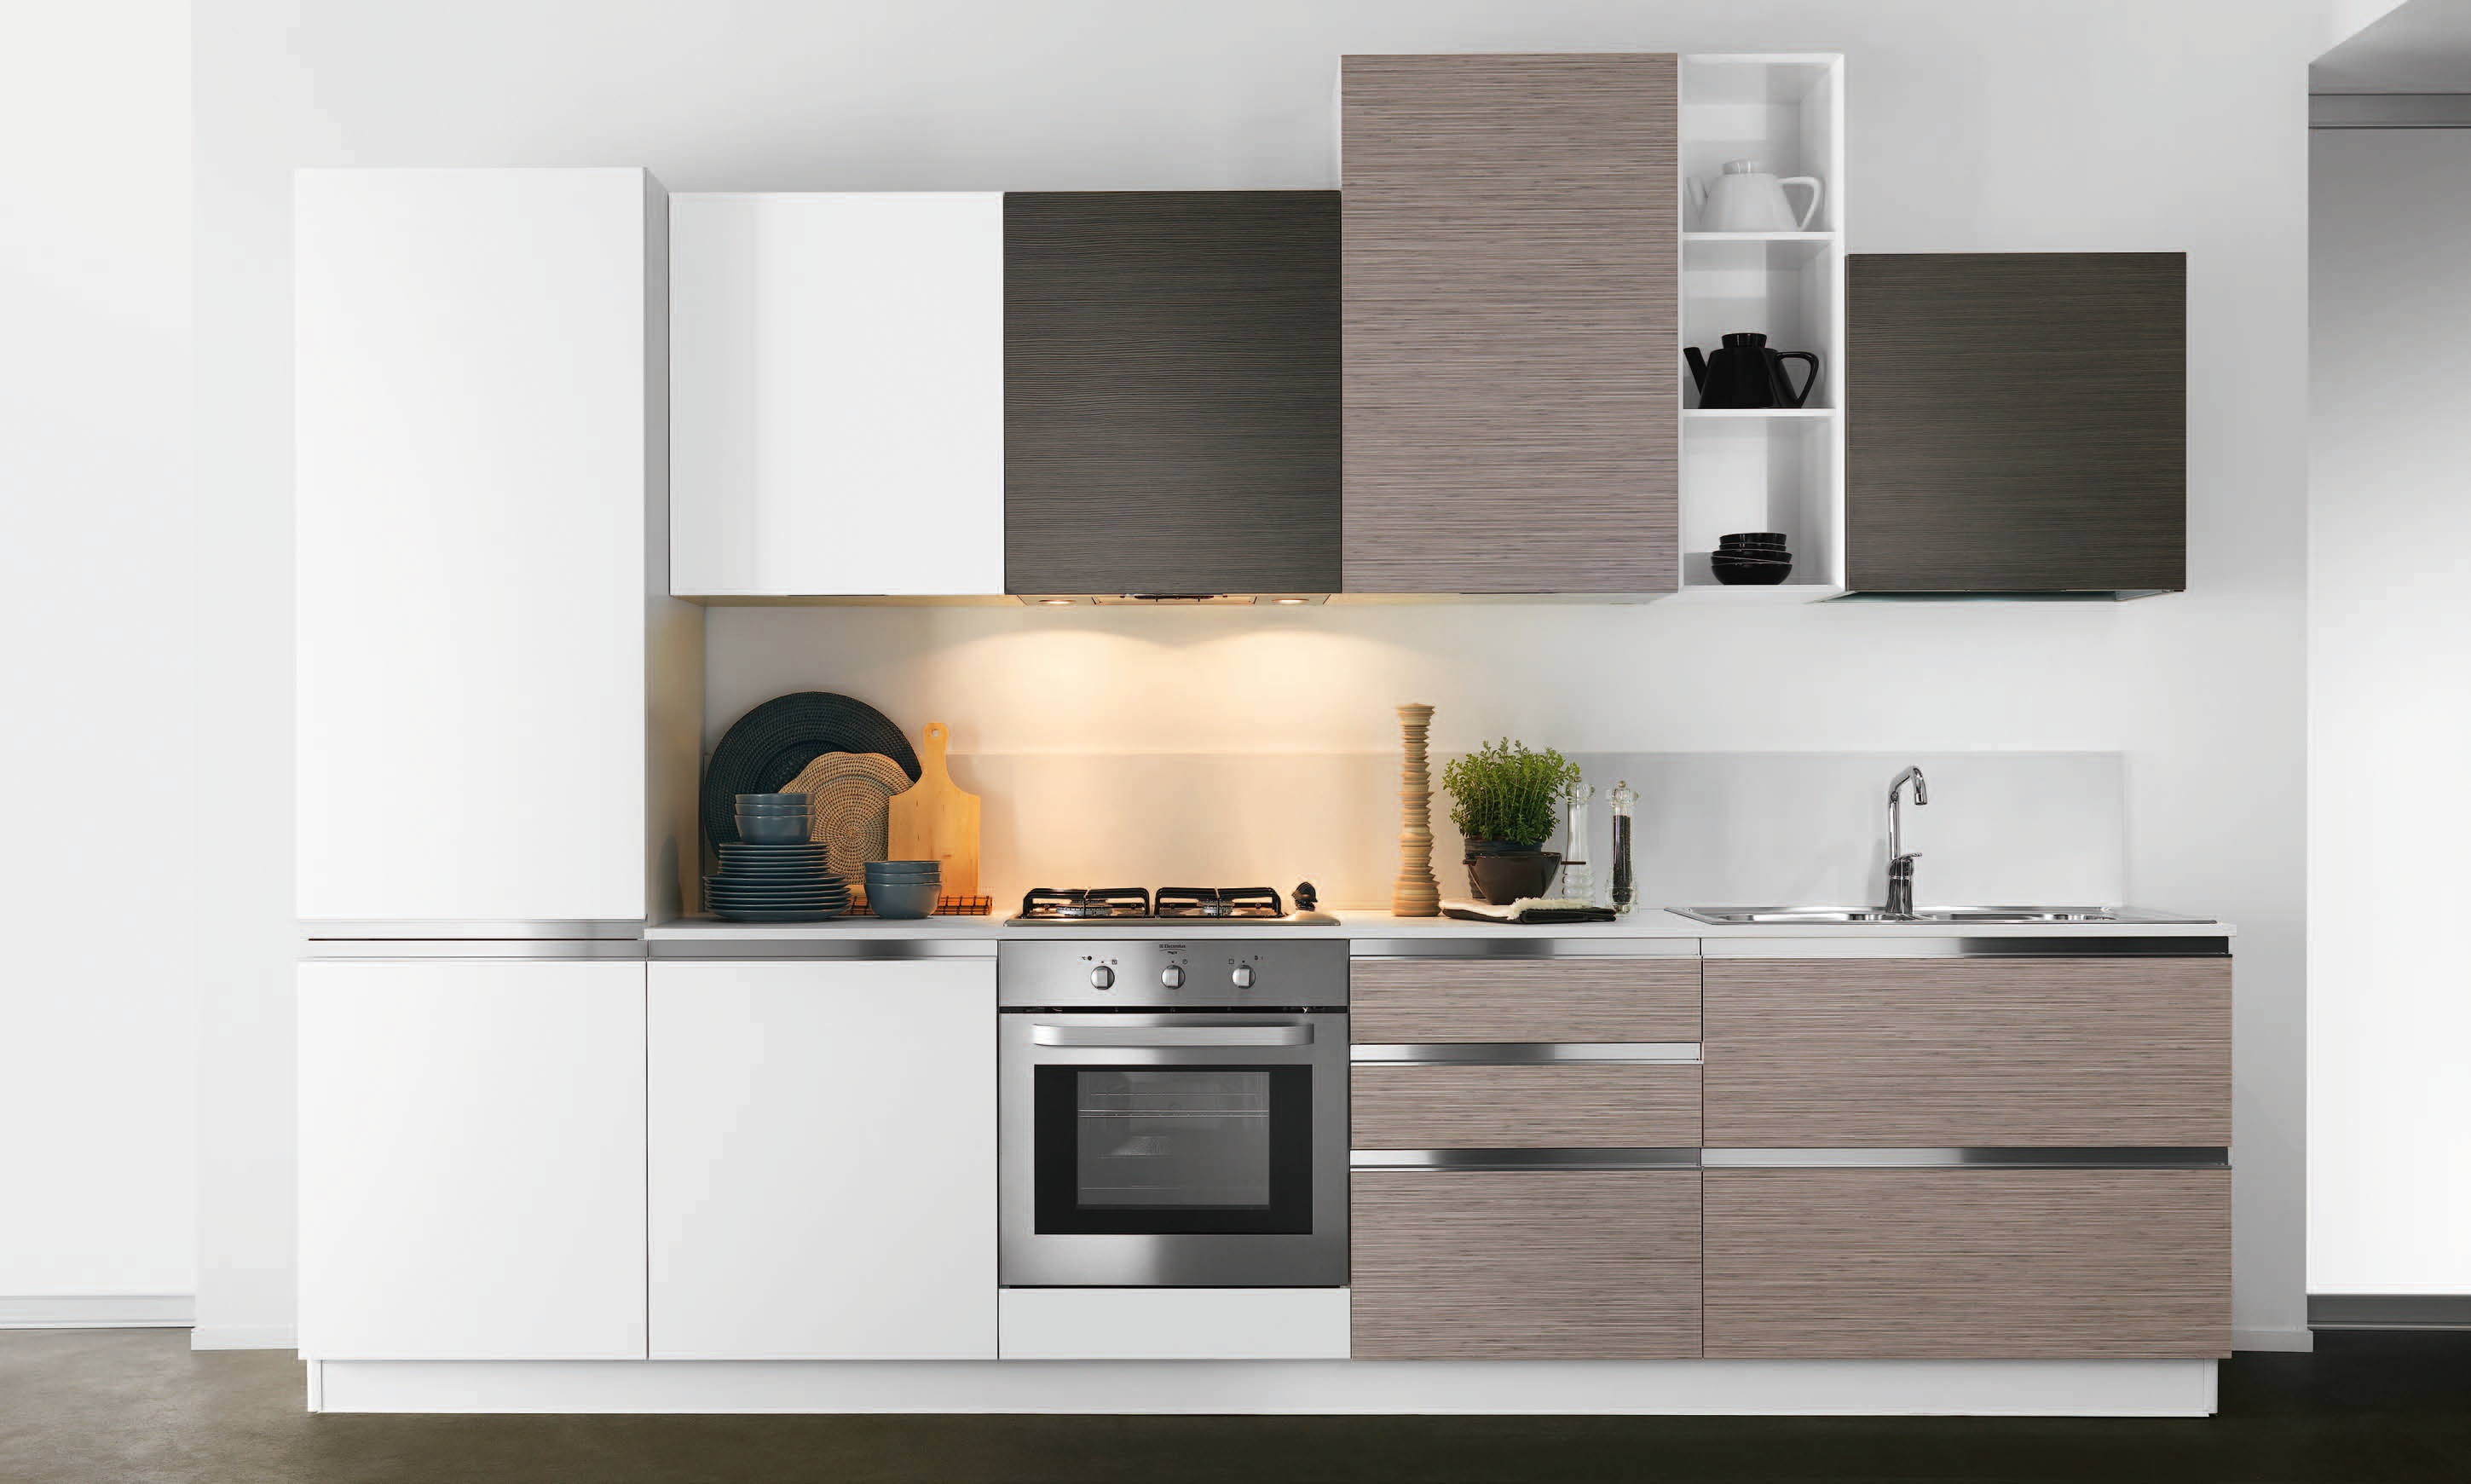 Arredodesignonline settembre 2013 - Cucina moderna design ...